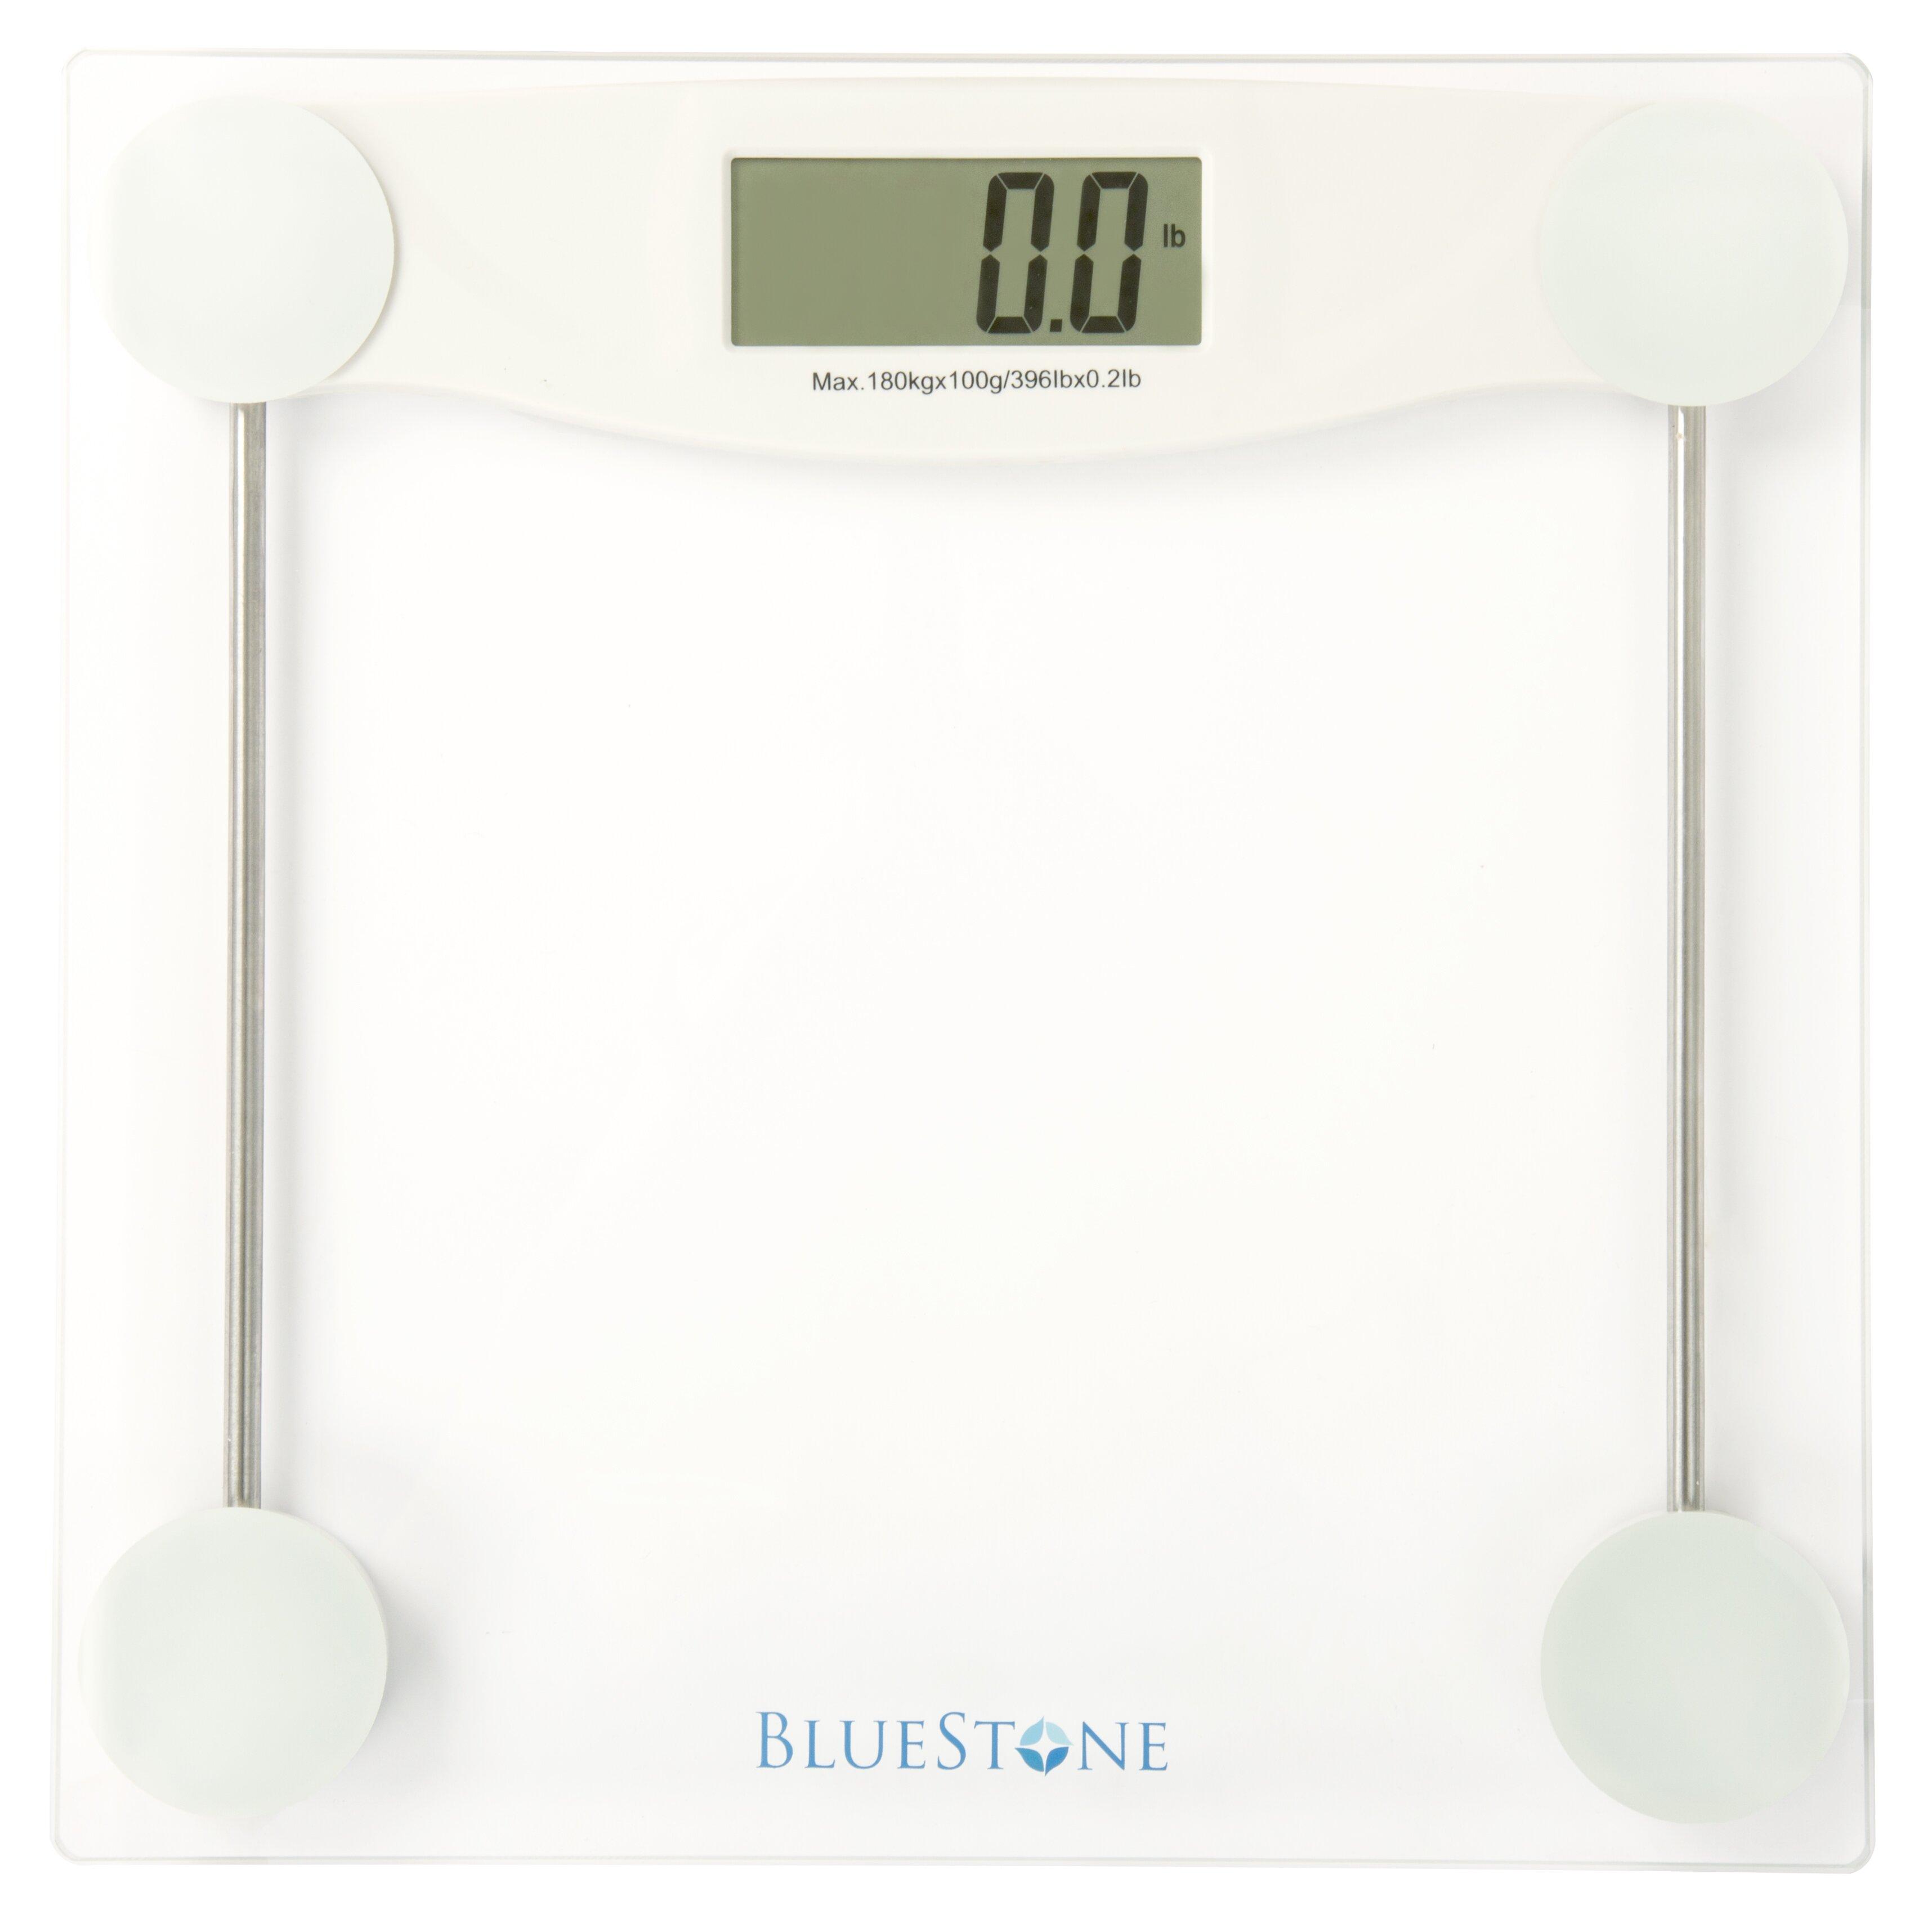 Briscoes weightwatchers bathroom scale body analysis 303a - Best Bathroom Scale Best Smart Scale Review See The Choice For The Best Bathroom Scales Sweethome